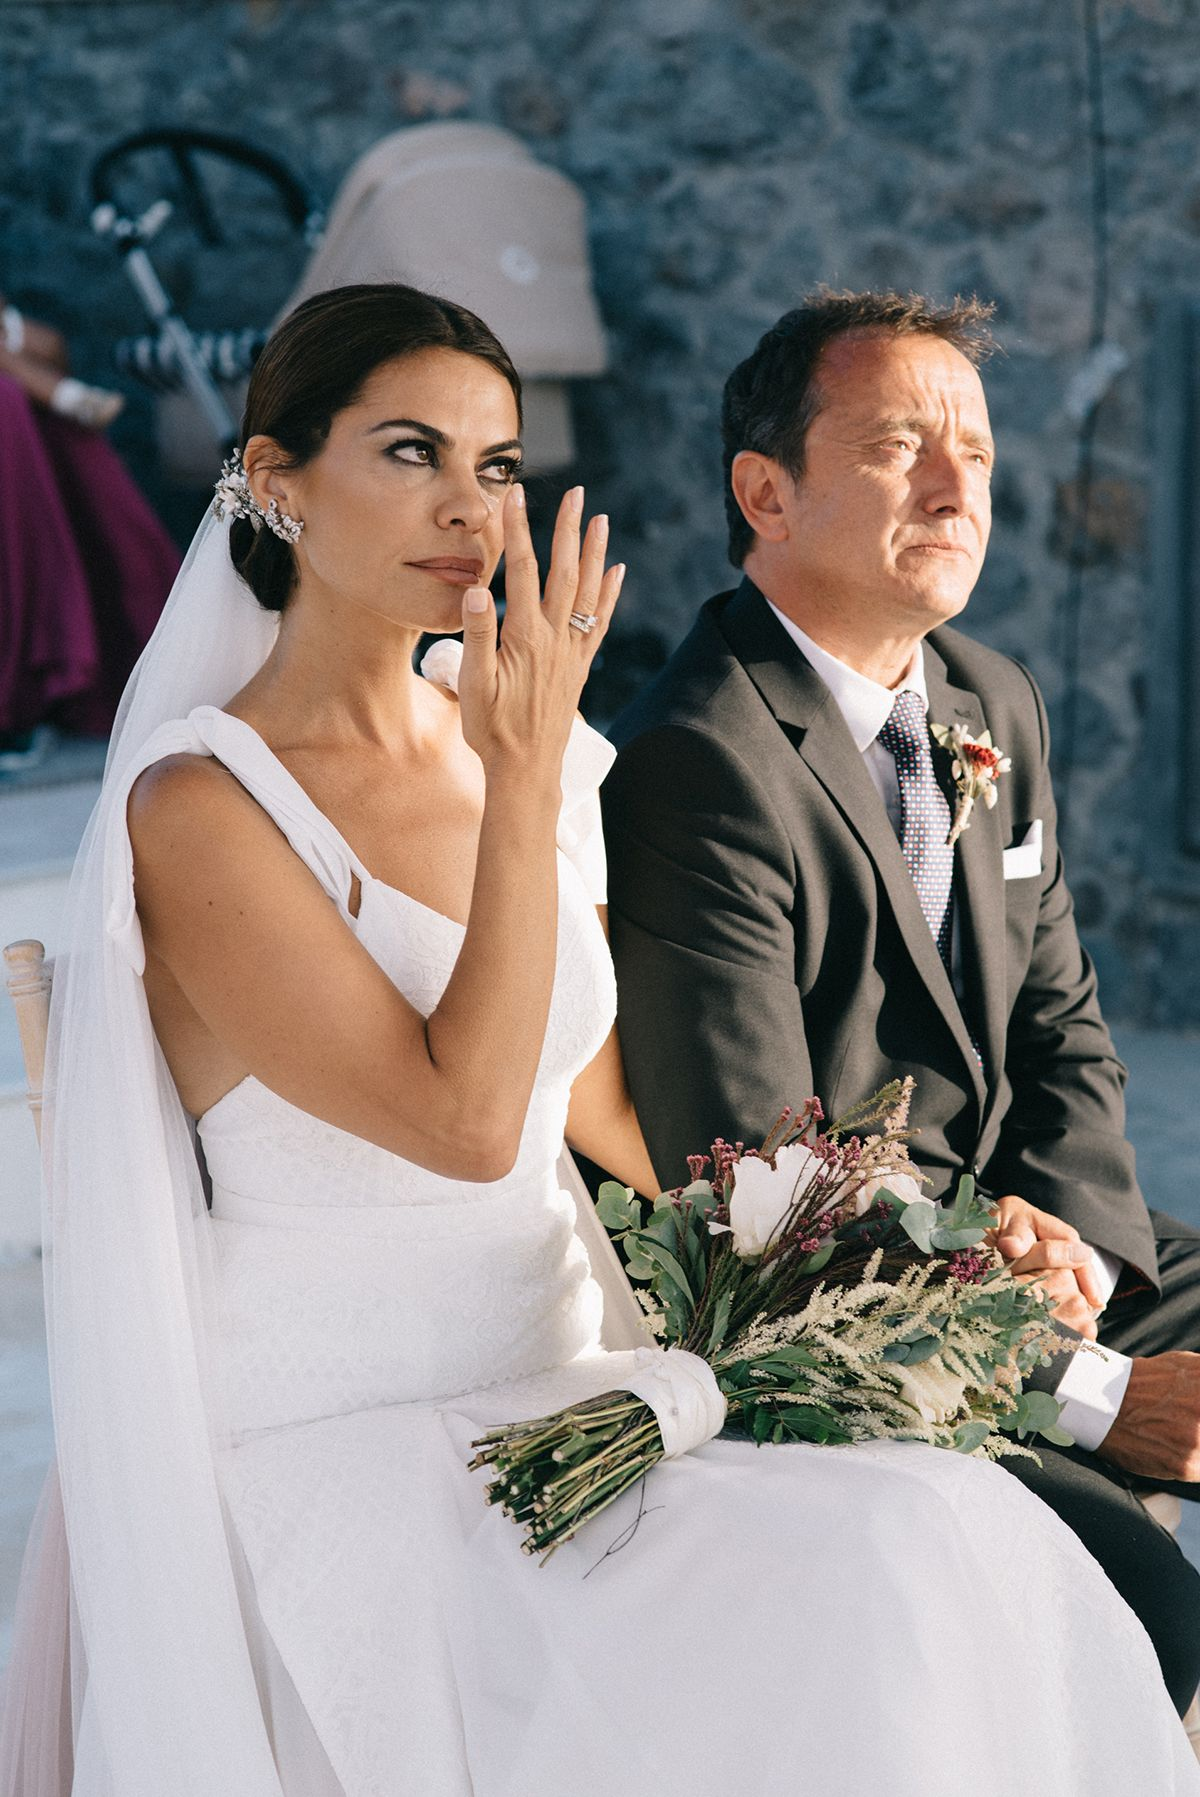 La-boda-de-MarC3ADa-JosC3A9-SuC3A1rez-y-Jordi-Nieto-100.jpg